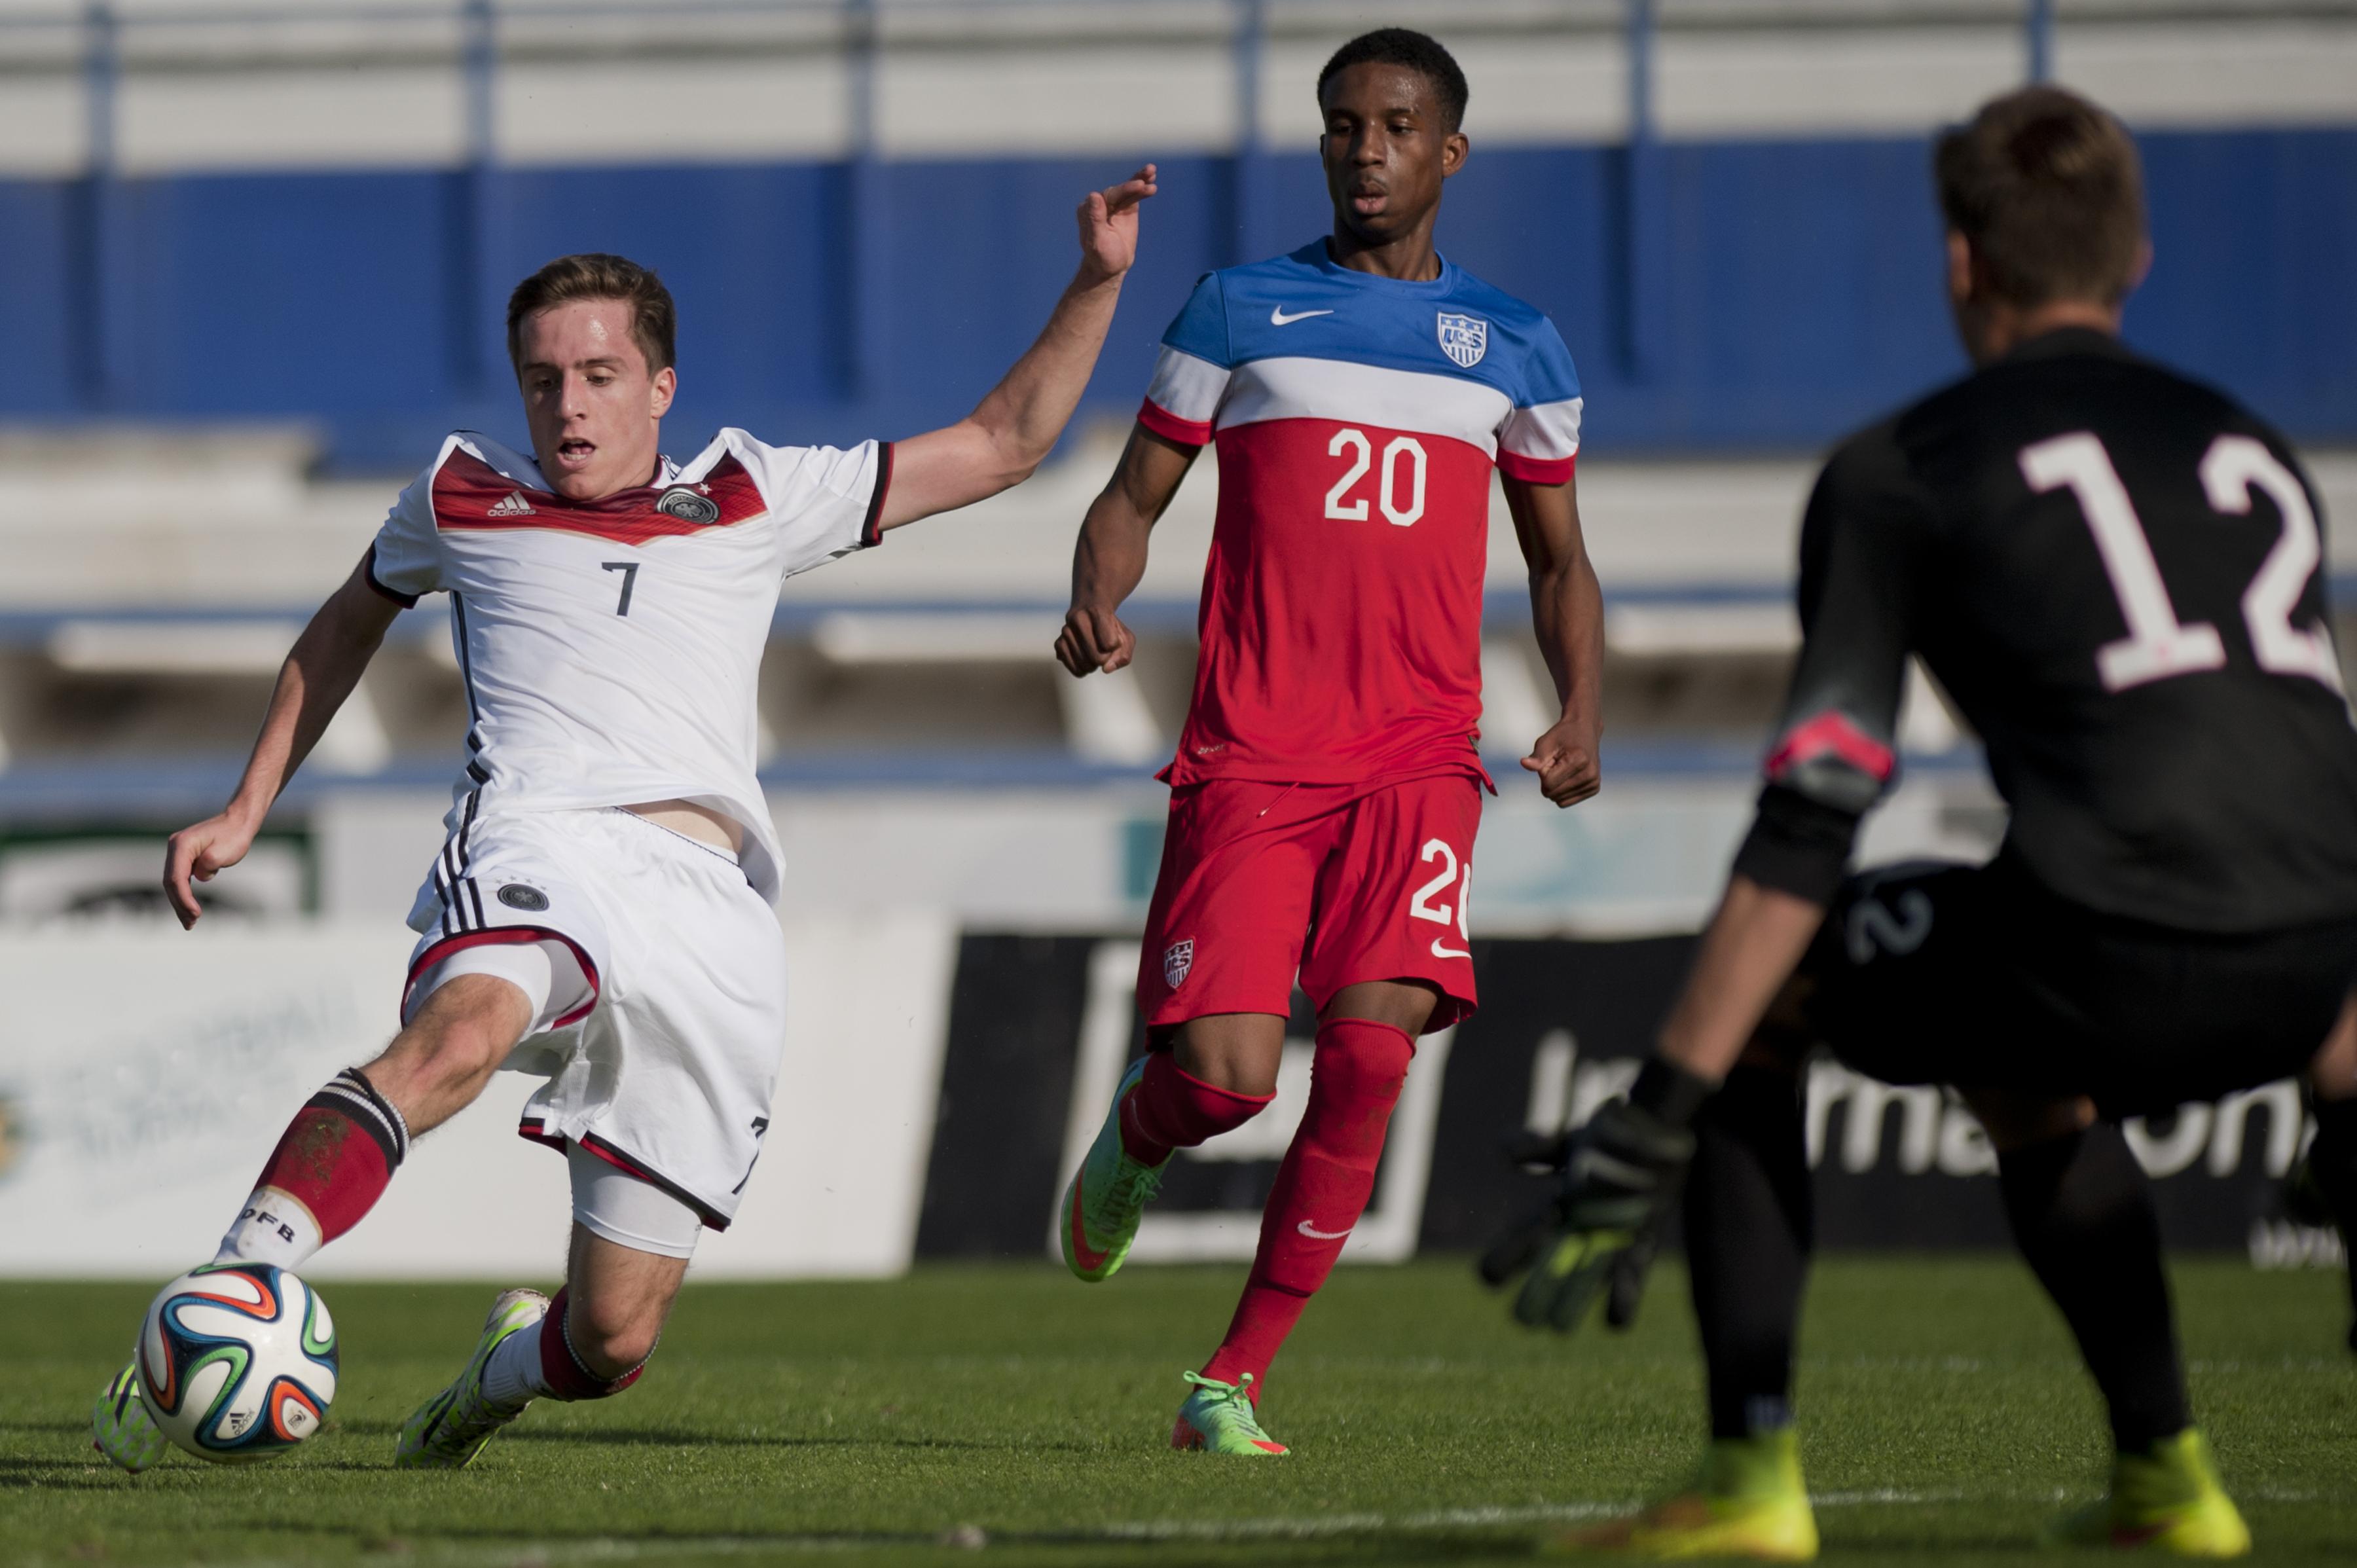 U18 USA v U18 Germany - International Friendly